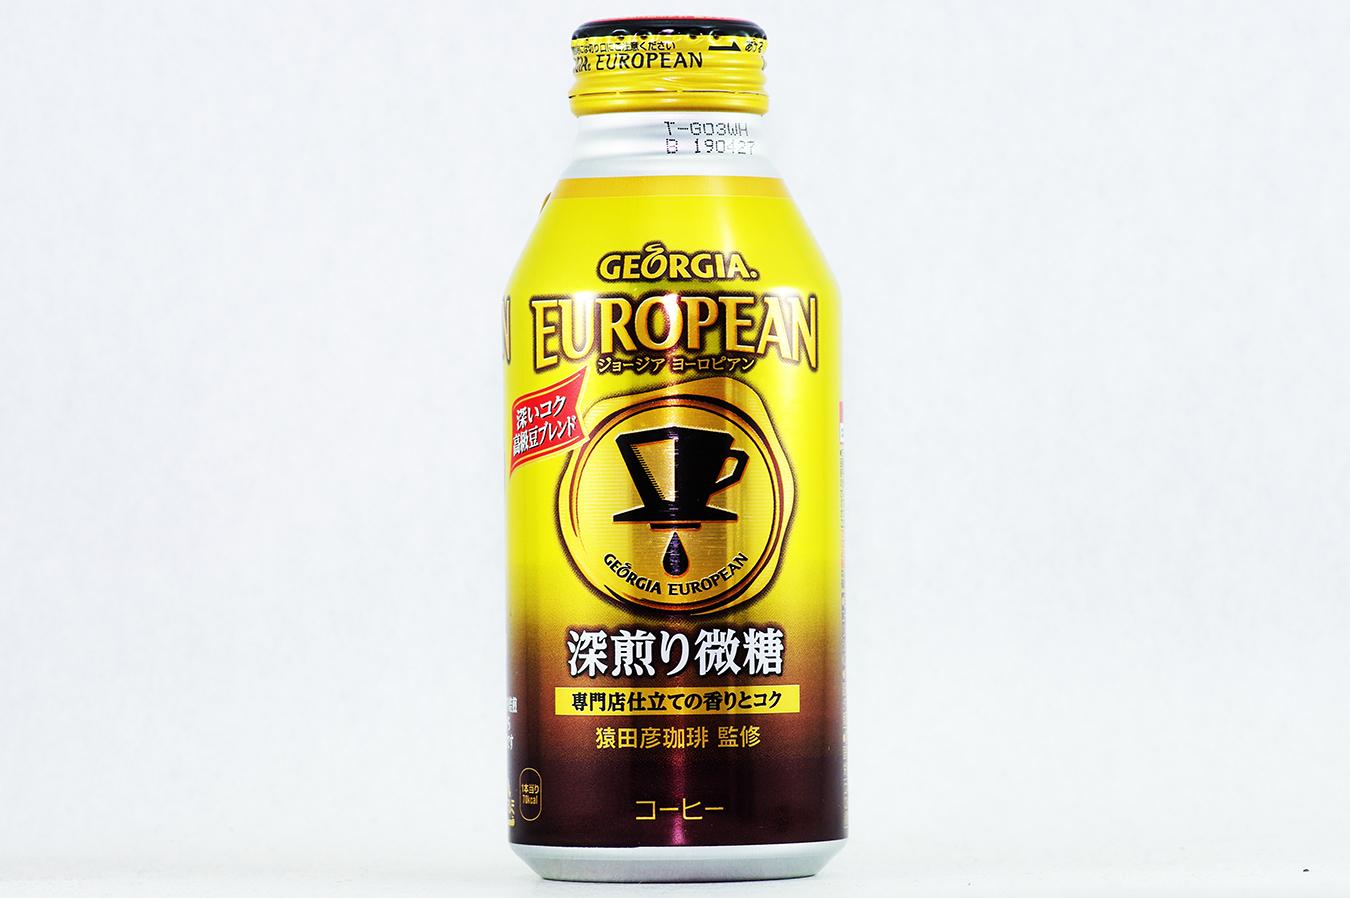 GEORGIA ヨーロピアン 深煎り微糖 370mlボトル缶 2018年8月